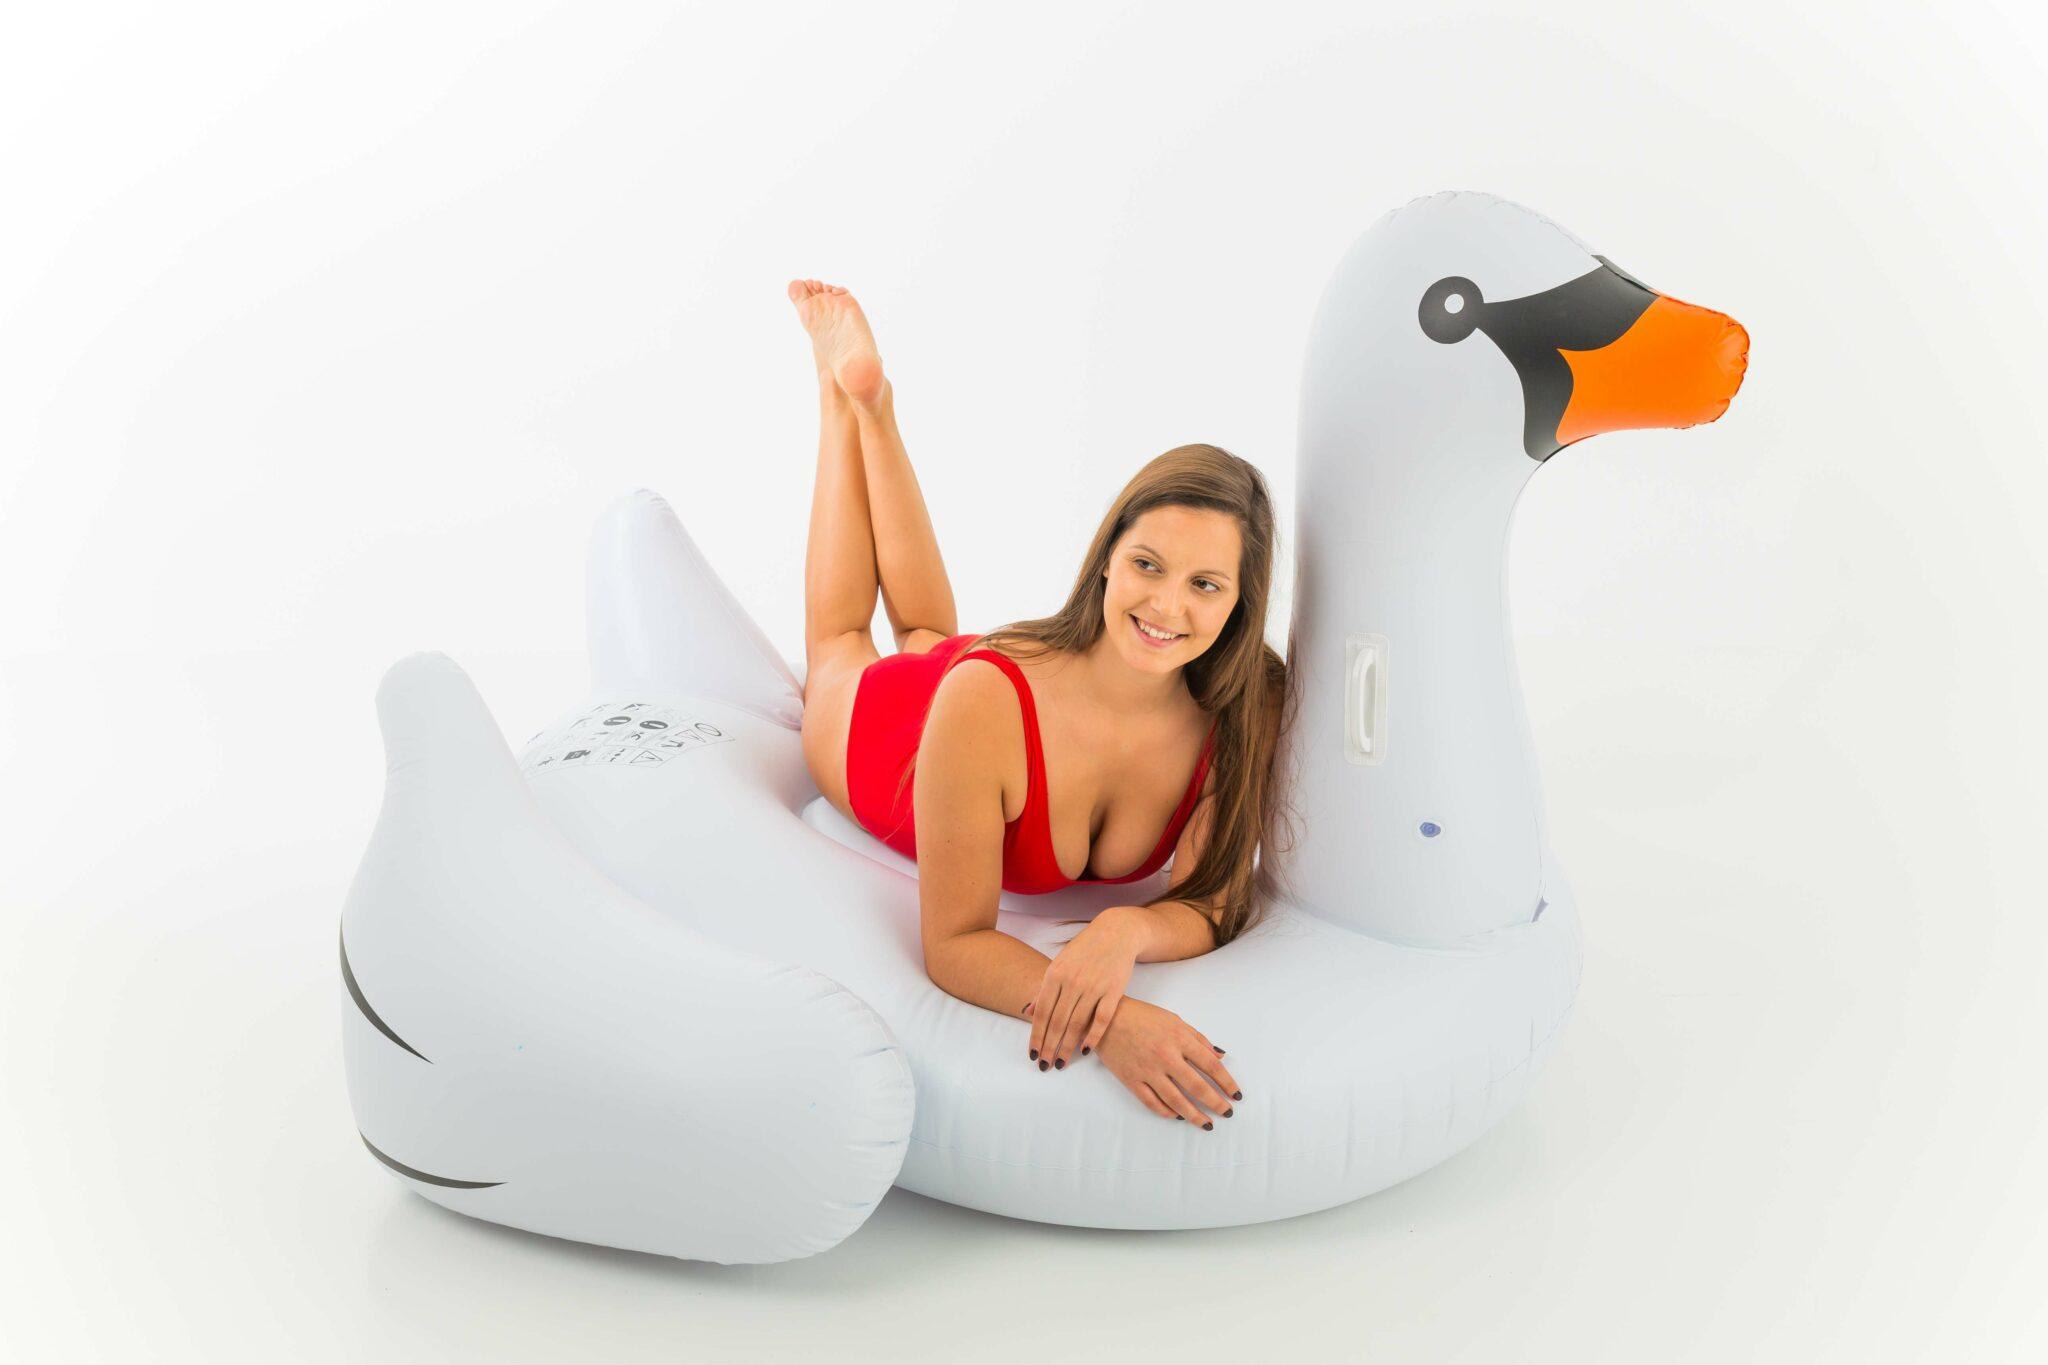 Big Swan